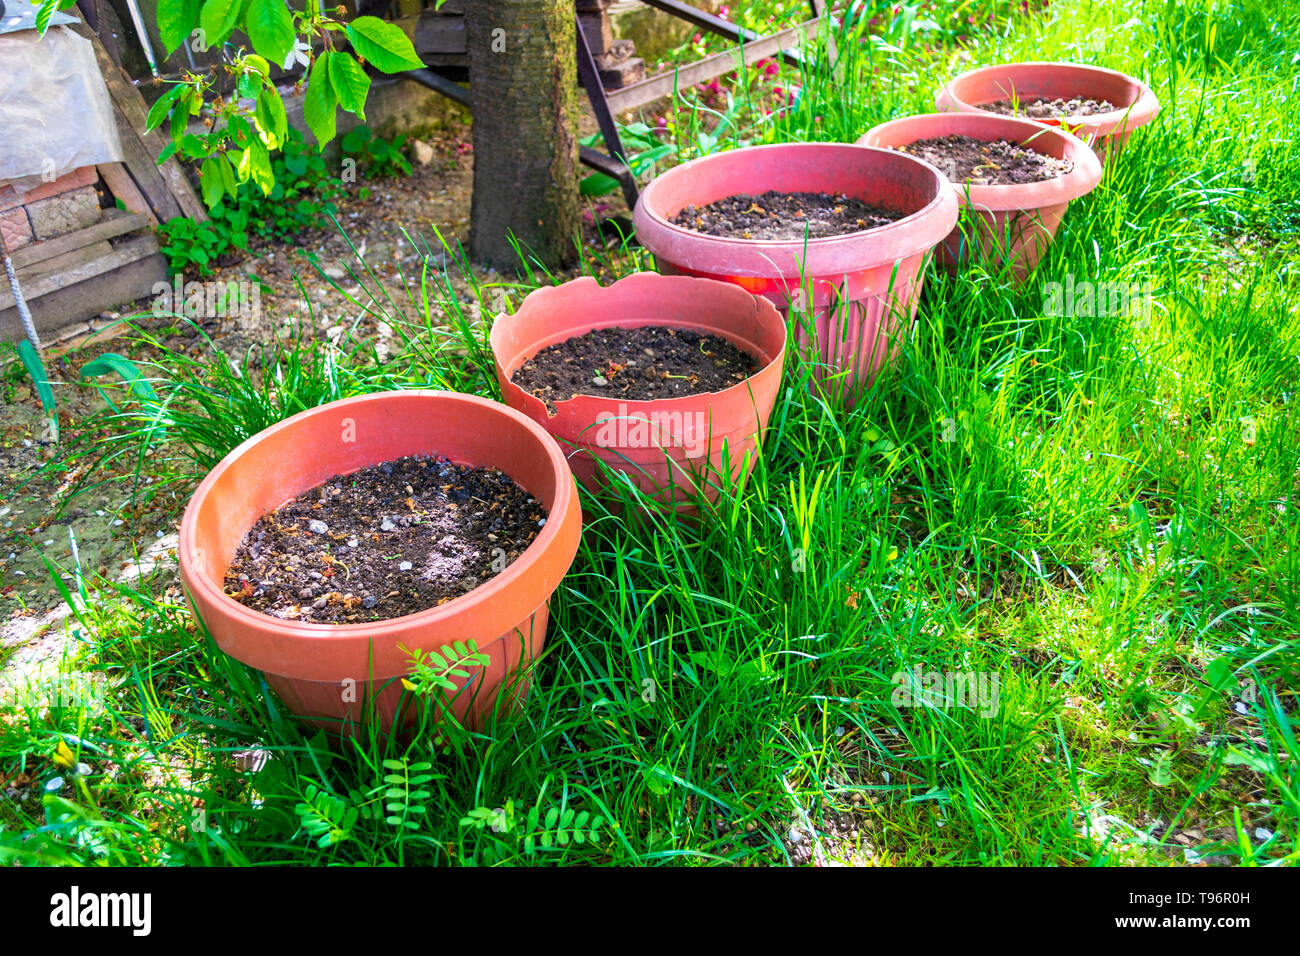 Alamy & Five big flower pots with garden potting soil under a tree laid ...